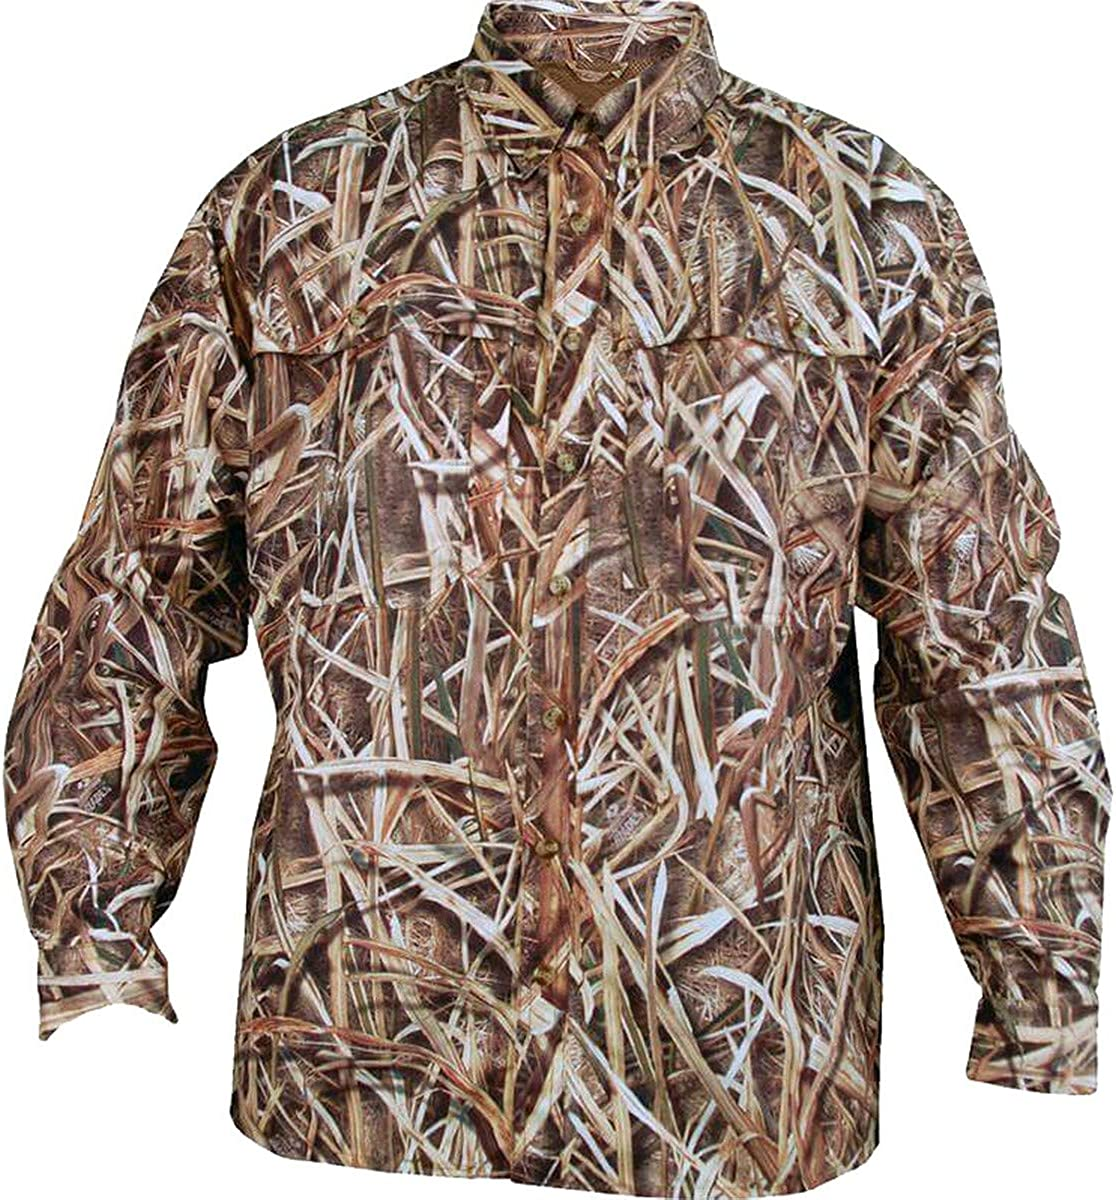 Browning, Wasatch-CB Long Sleeve Shirt, Mossy Oak Shadow Grass Blades, 2X-Large